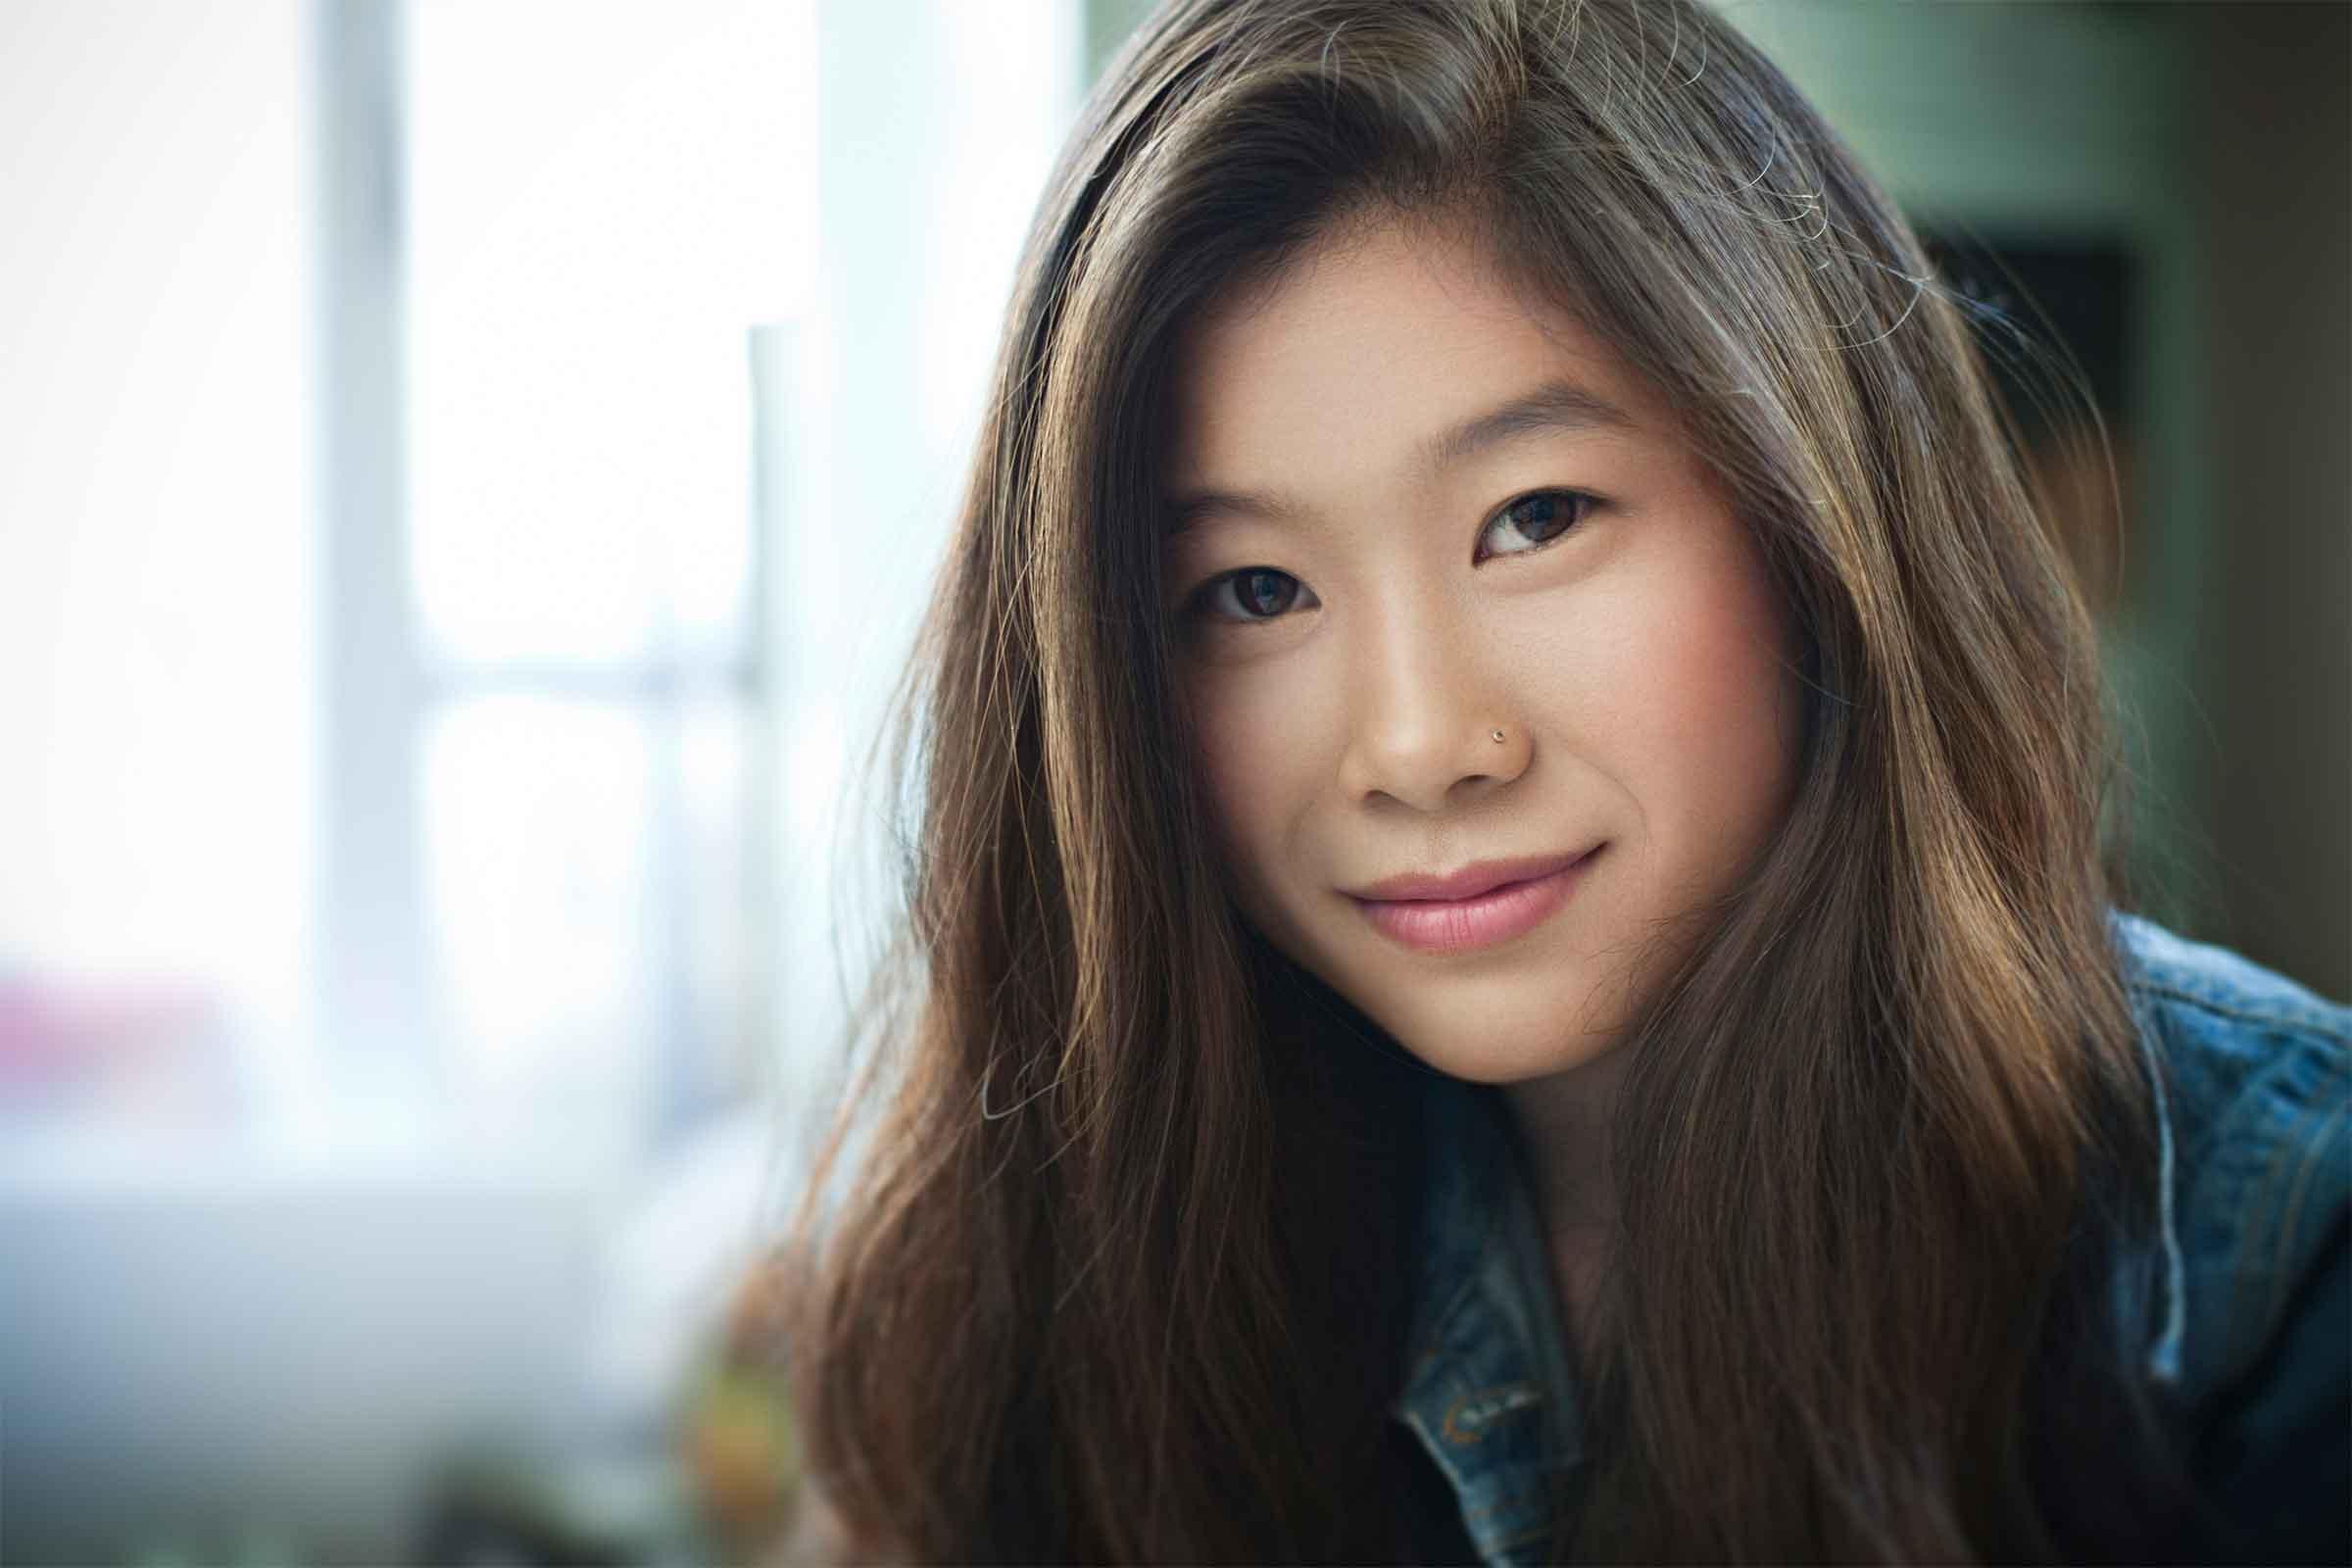 مدل موی زن ها و سبک شخصیت شان